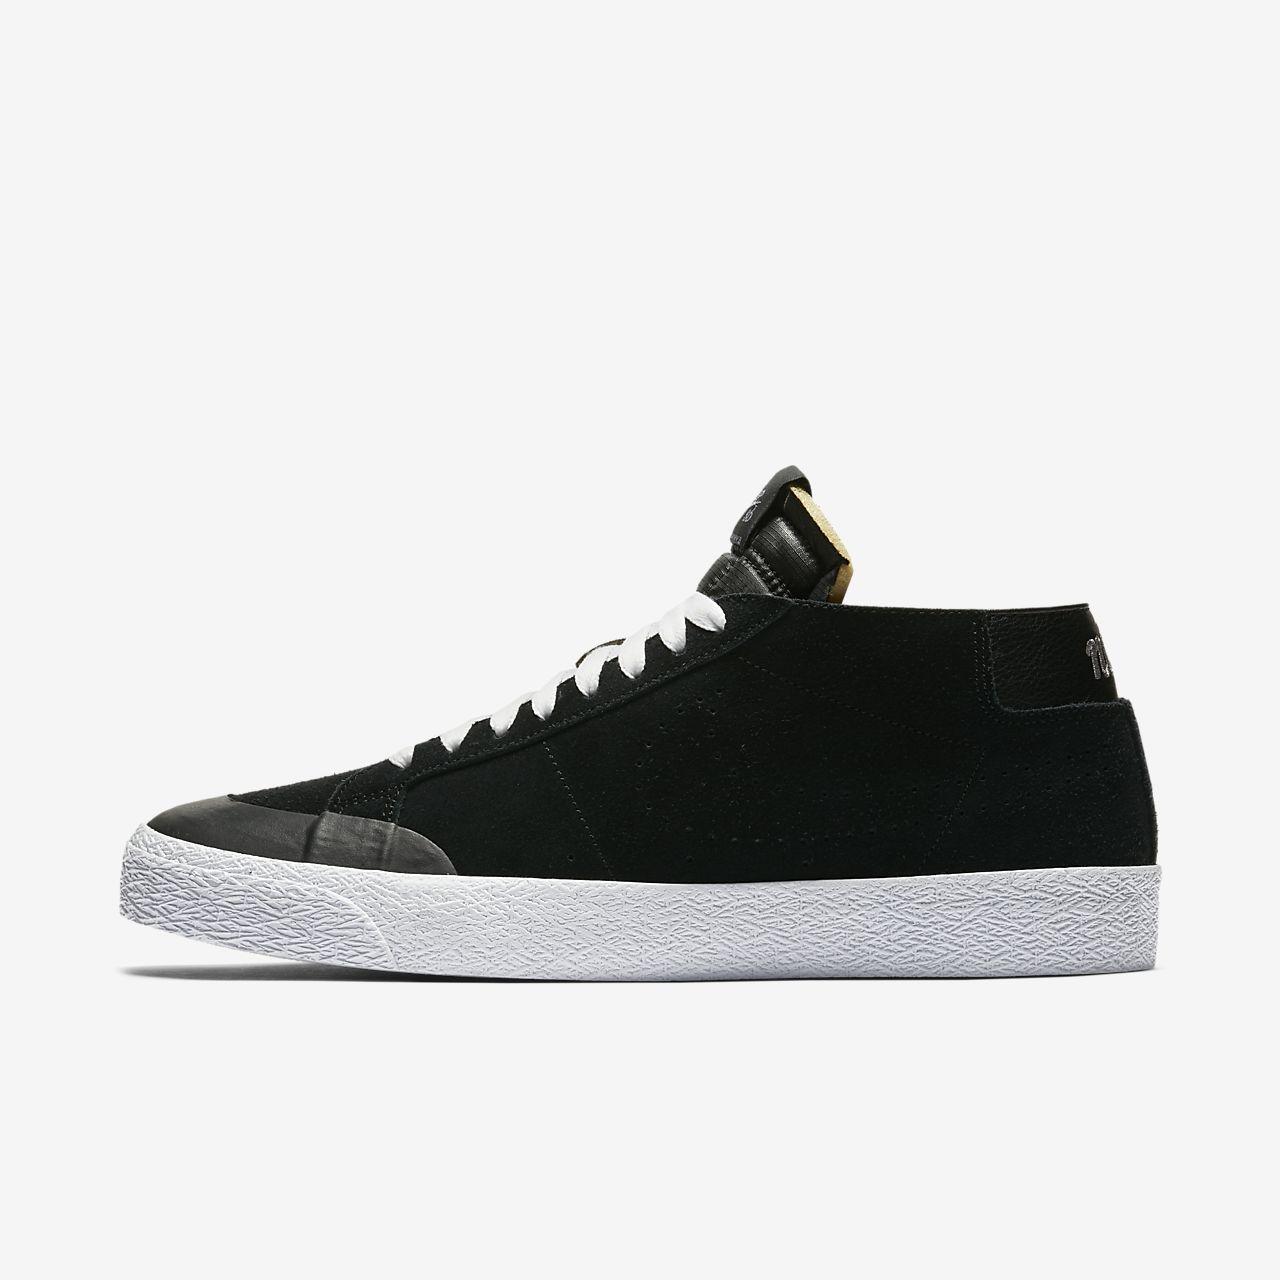 91ed19c3a Nike SB Zoom Blazer Chukka XT Men s Skateboarding Shoe. Nike.com AU